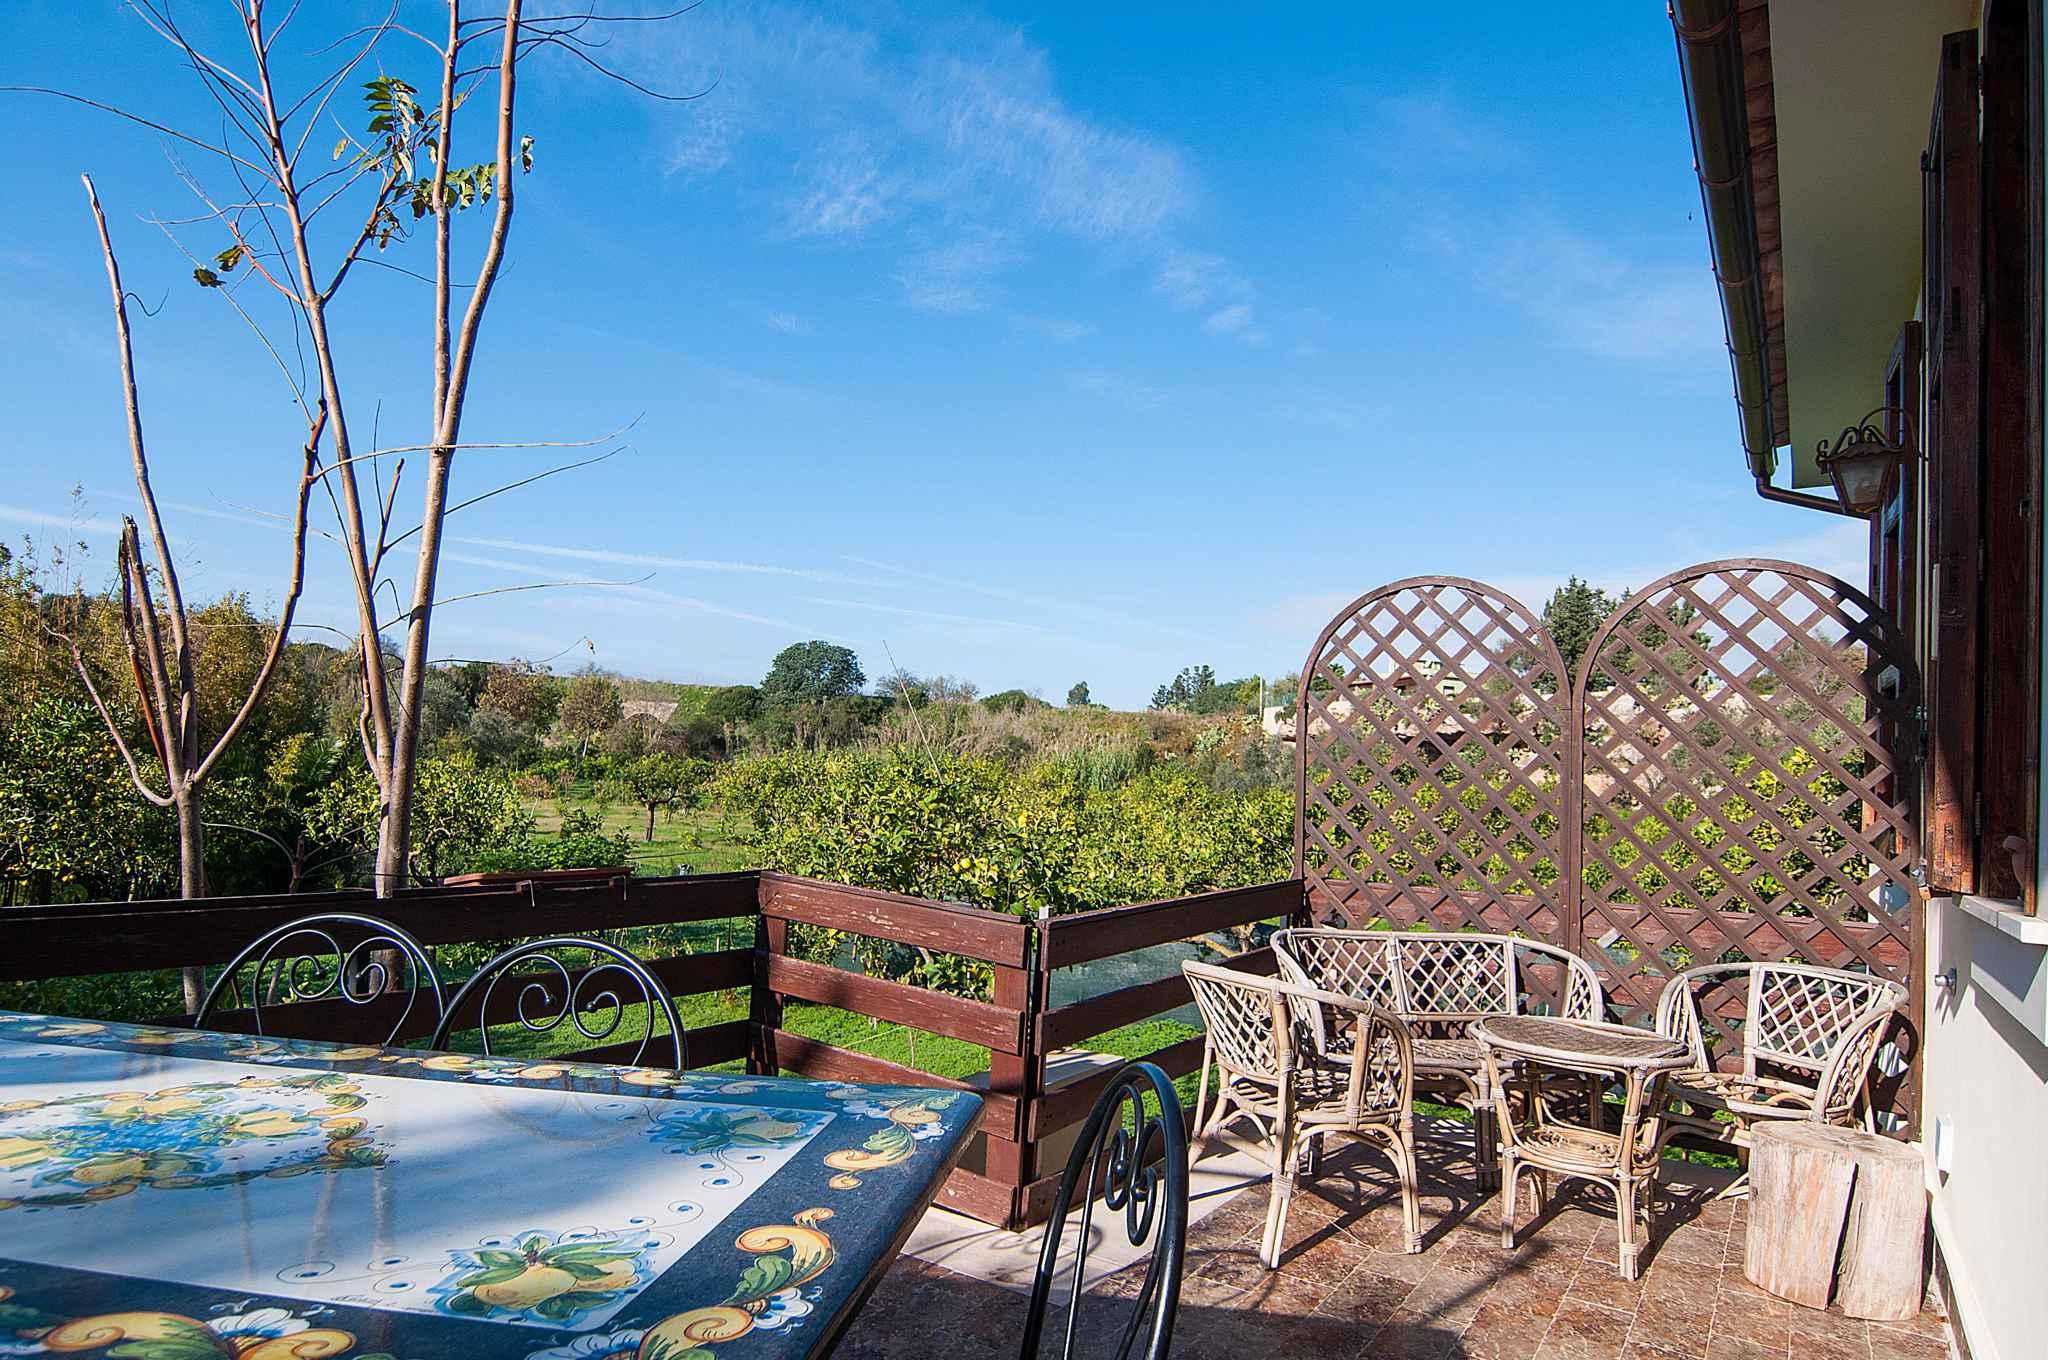 Maison de vacances mit Blick auf Zitronengarten (317534), Lido di Noto, Siracusa, Sicile, Italie, image 14